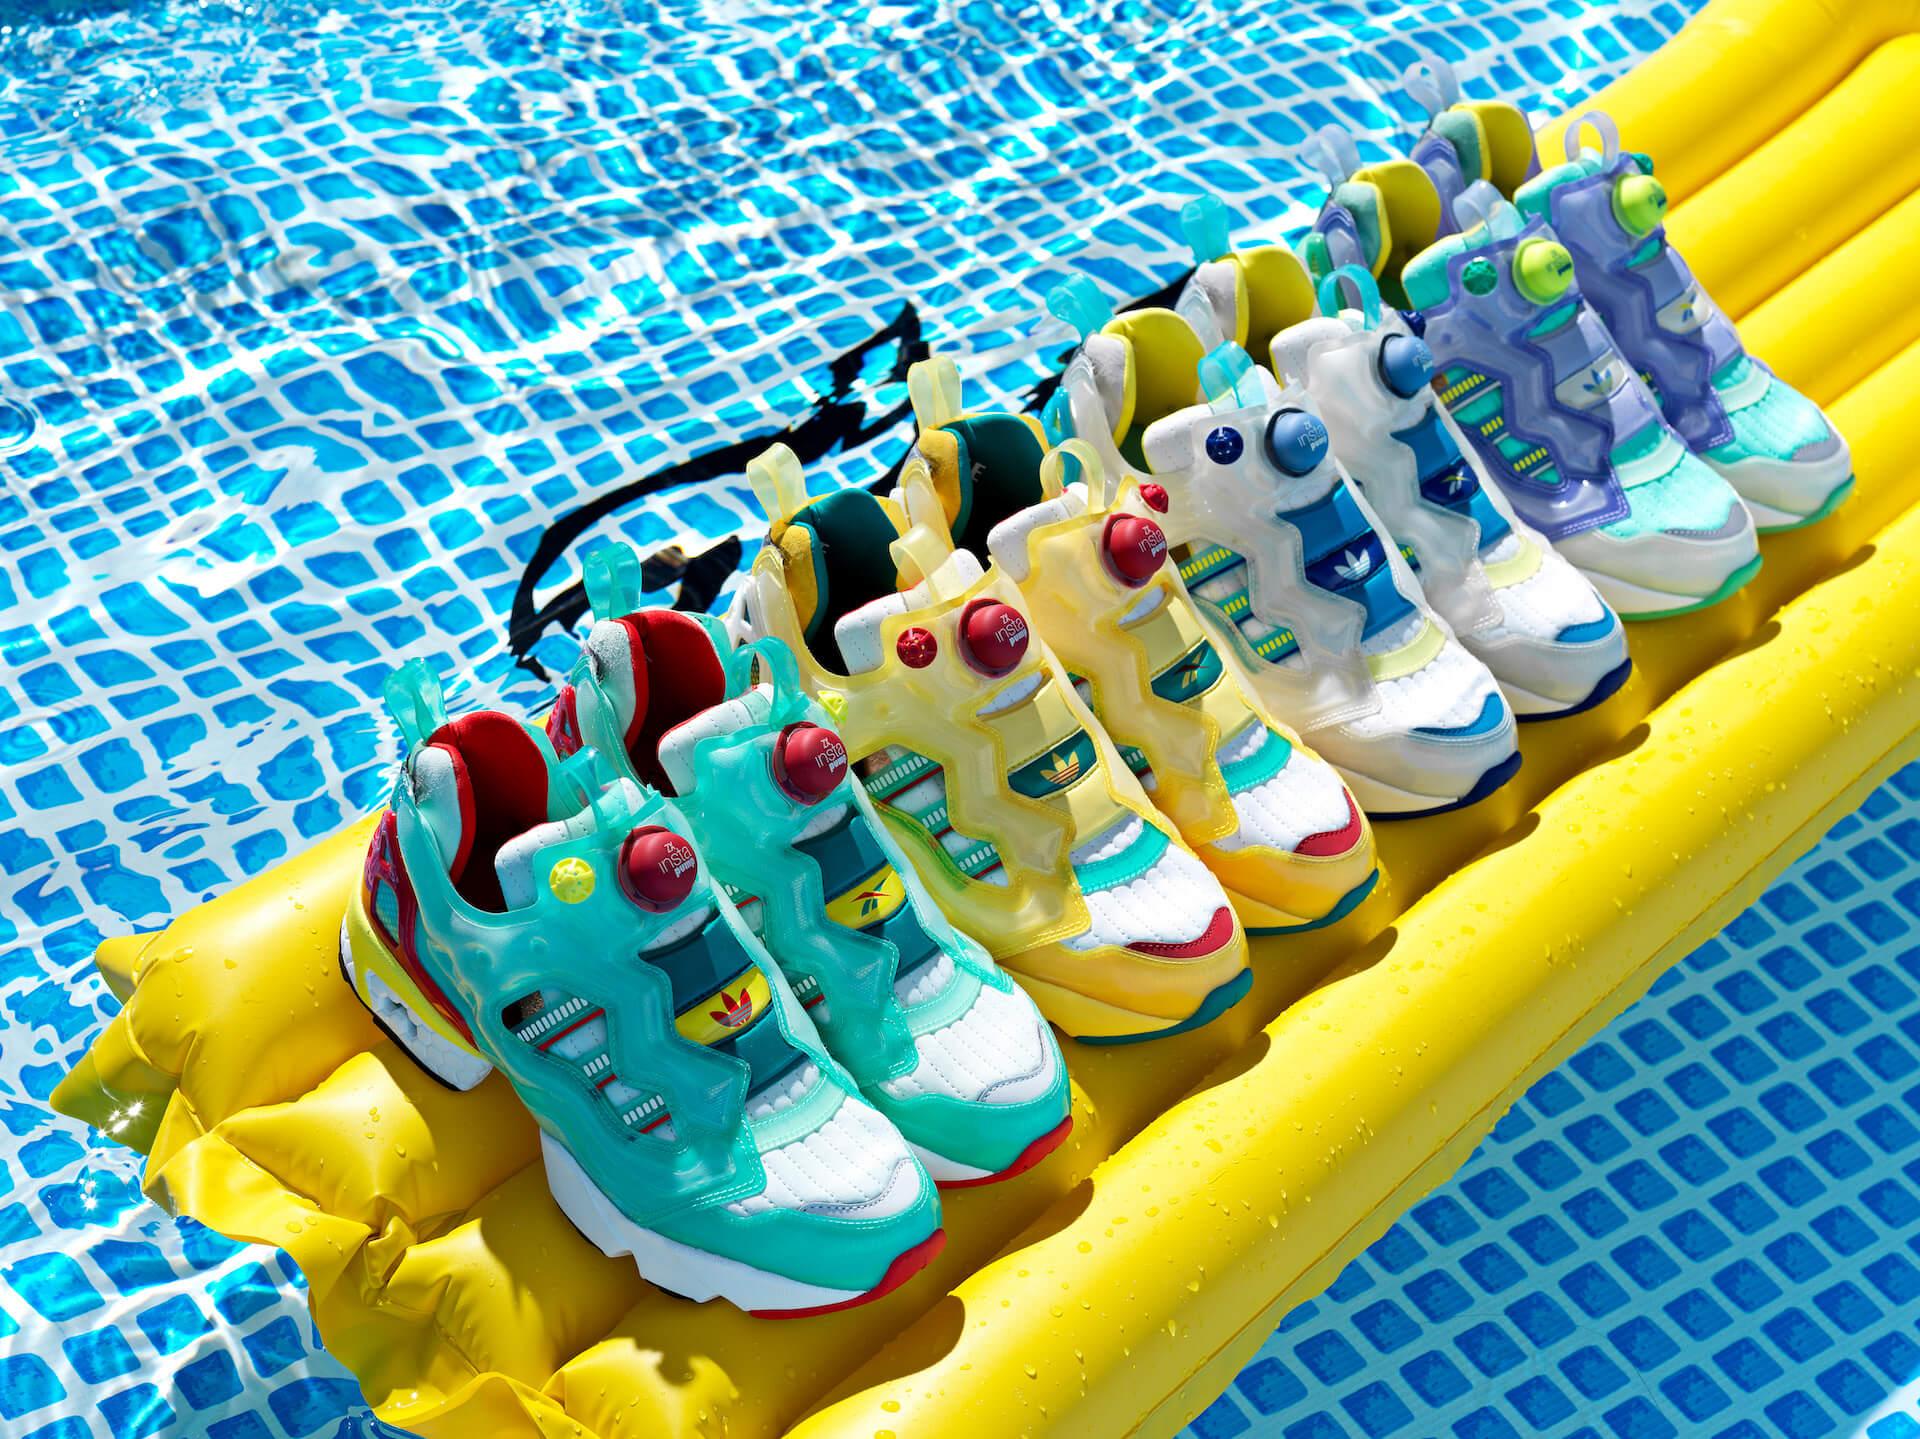 adidas OriginalsとReebokのコラボモデル「ZX FURY」に夏にぴったりの新色4色が登場! life210719_adidasoriginals_reebok_12